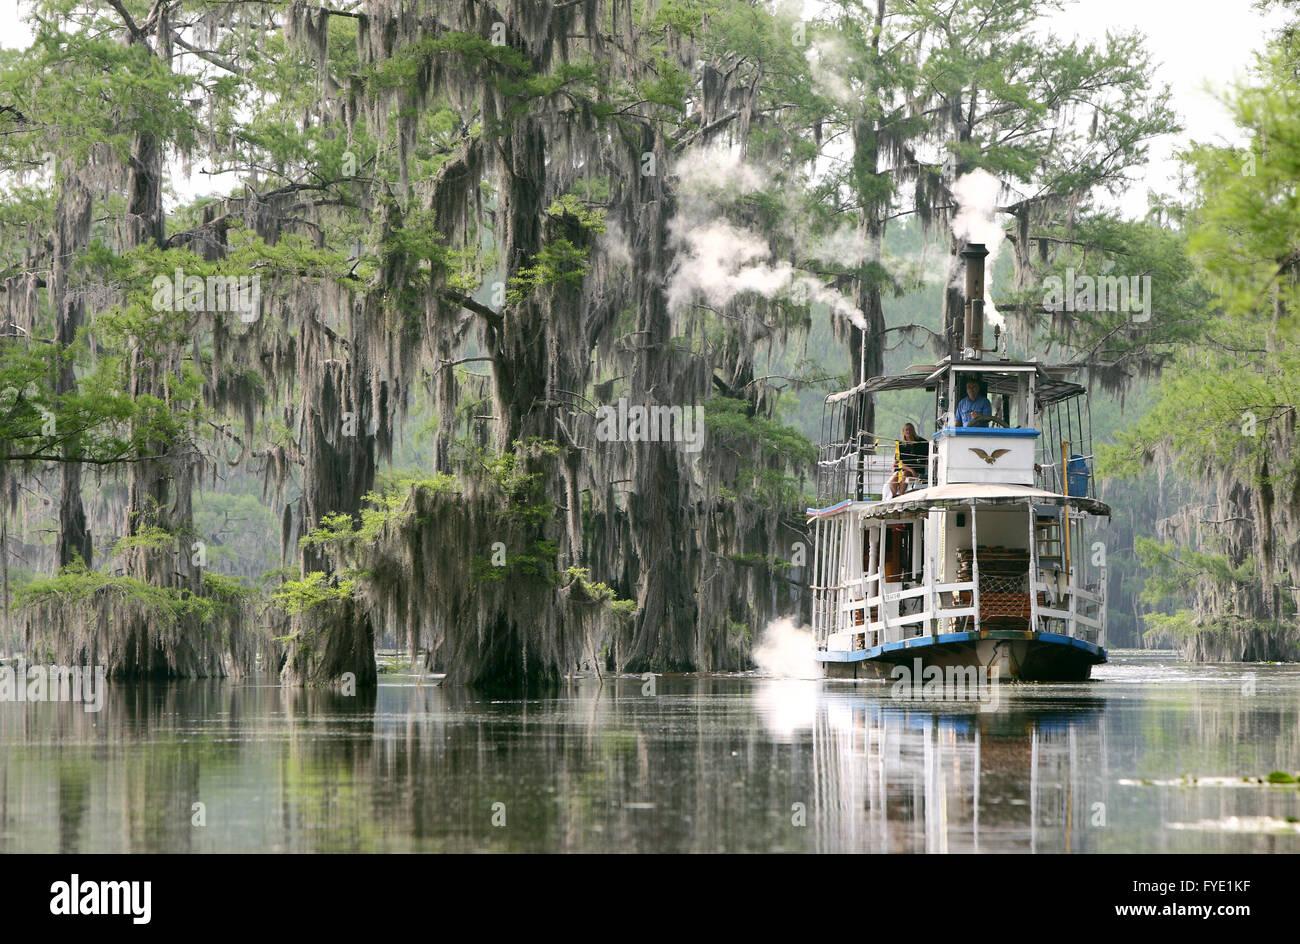 Boat Tours Of Caddo Lake